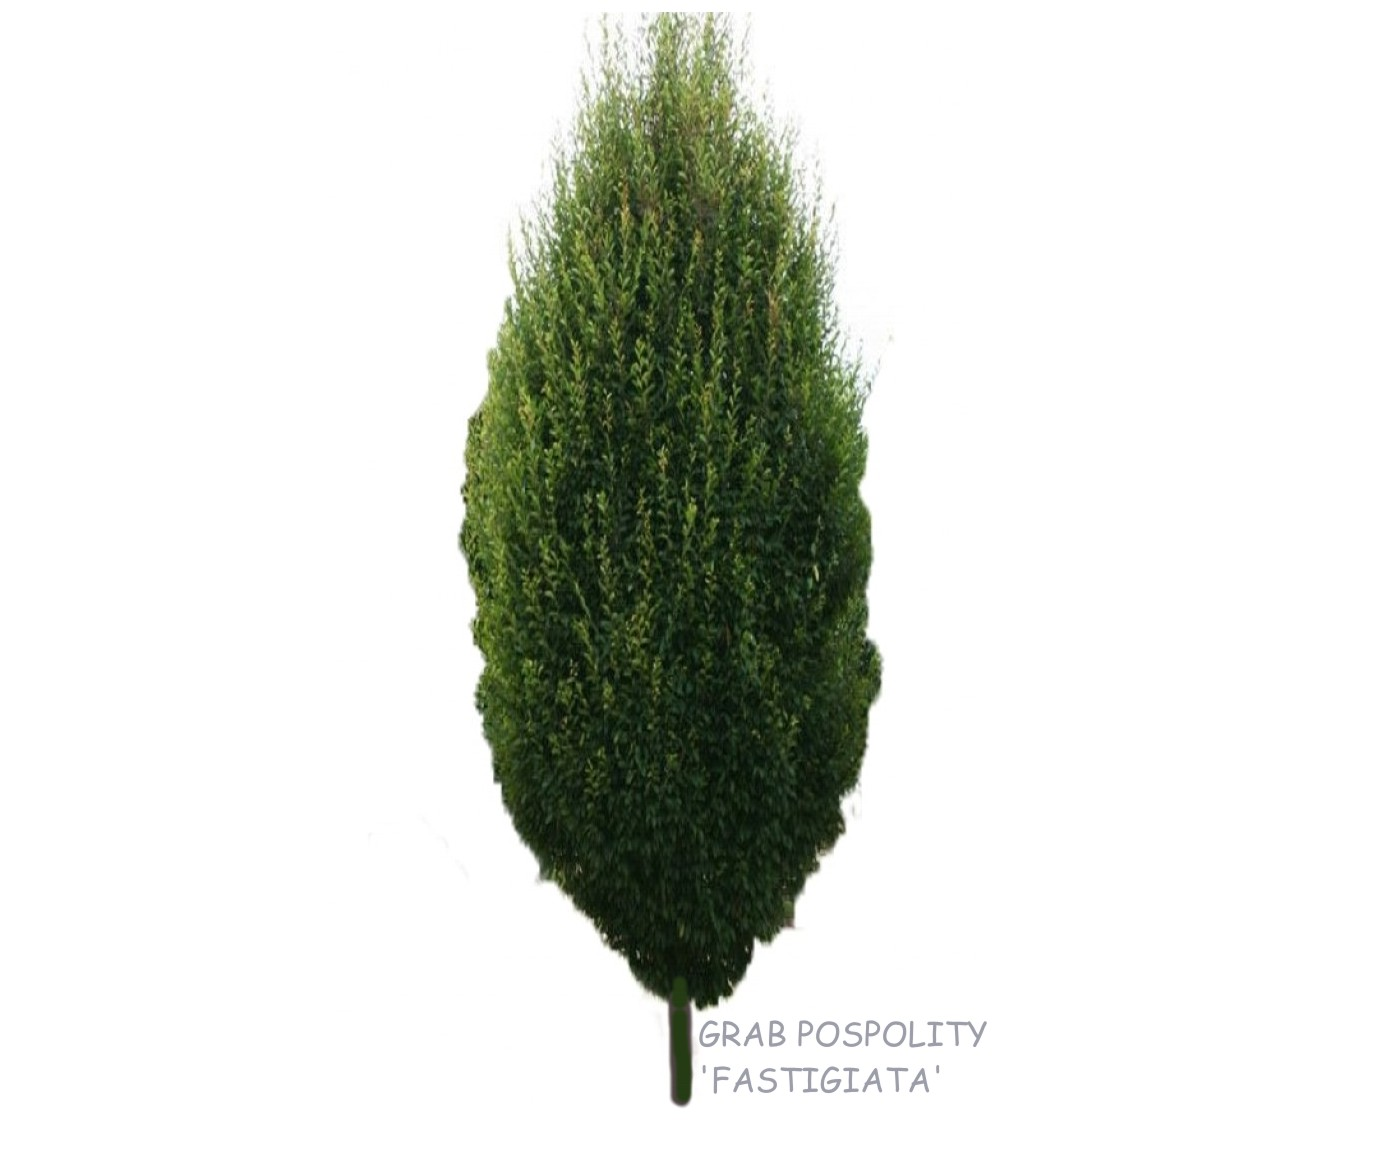 Grab pospolity Fastigiata, obwód pnia 25-27 cm